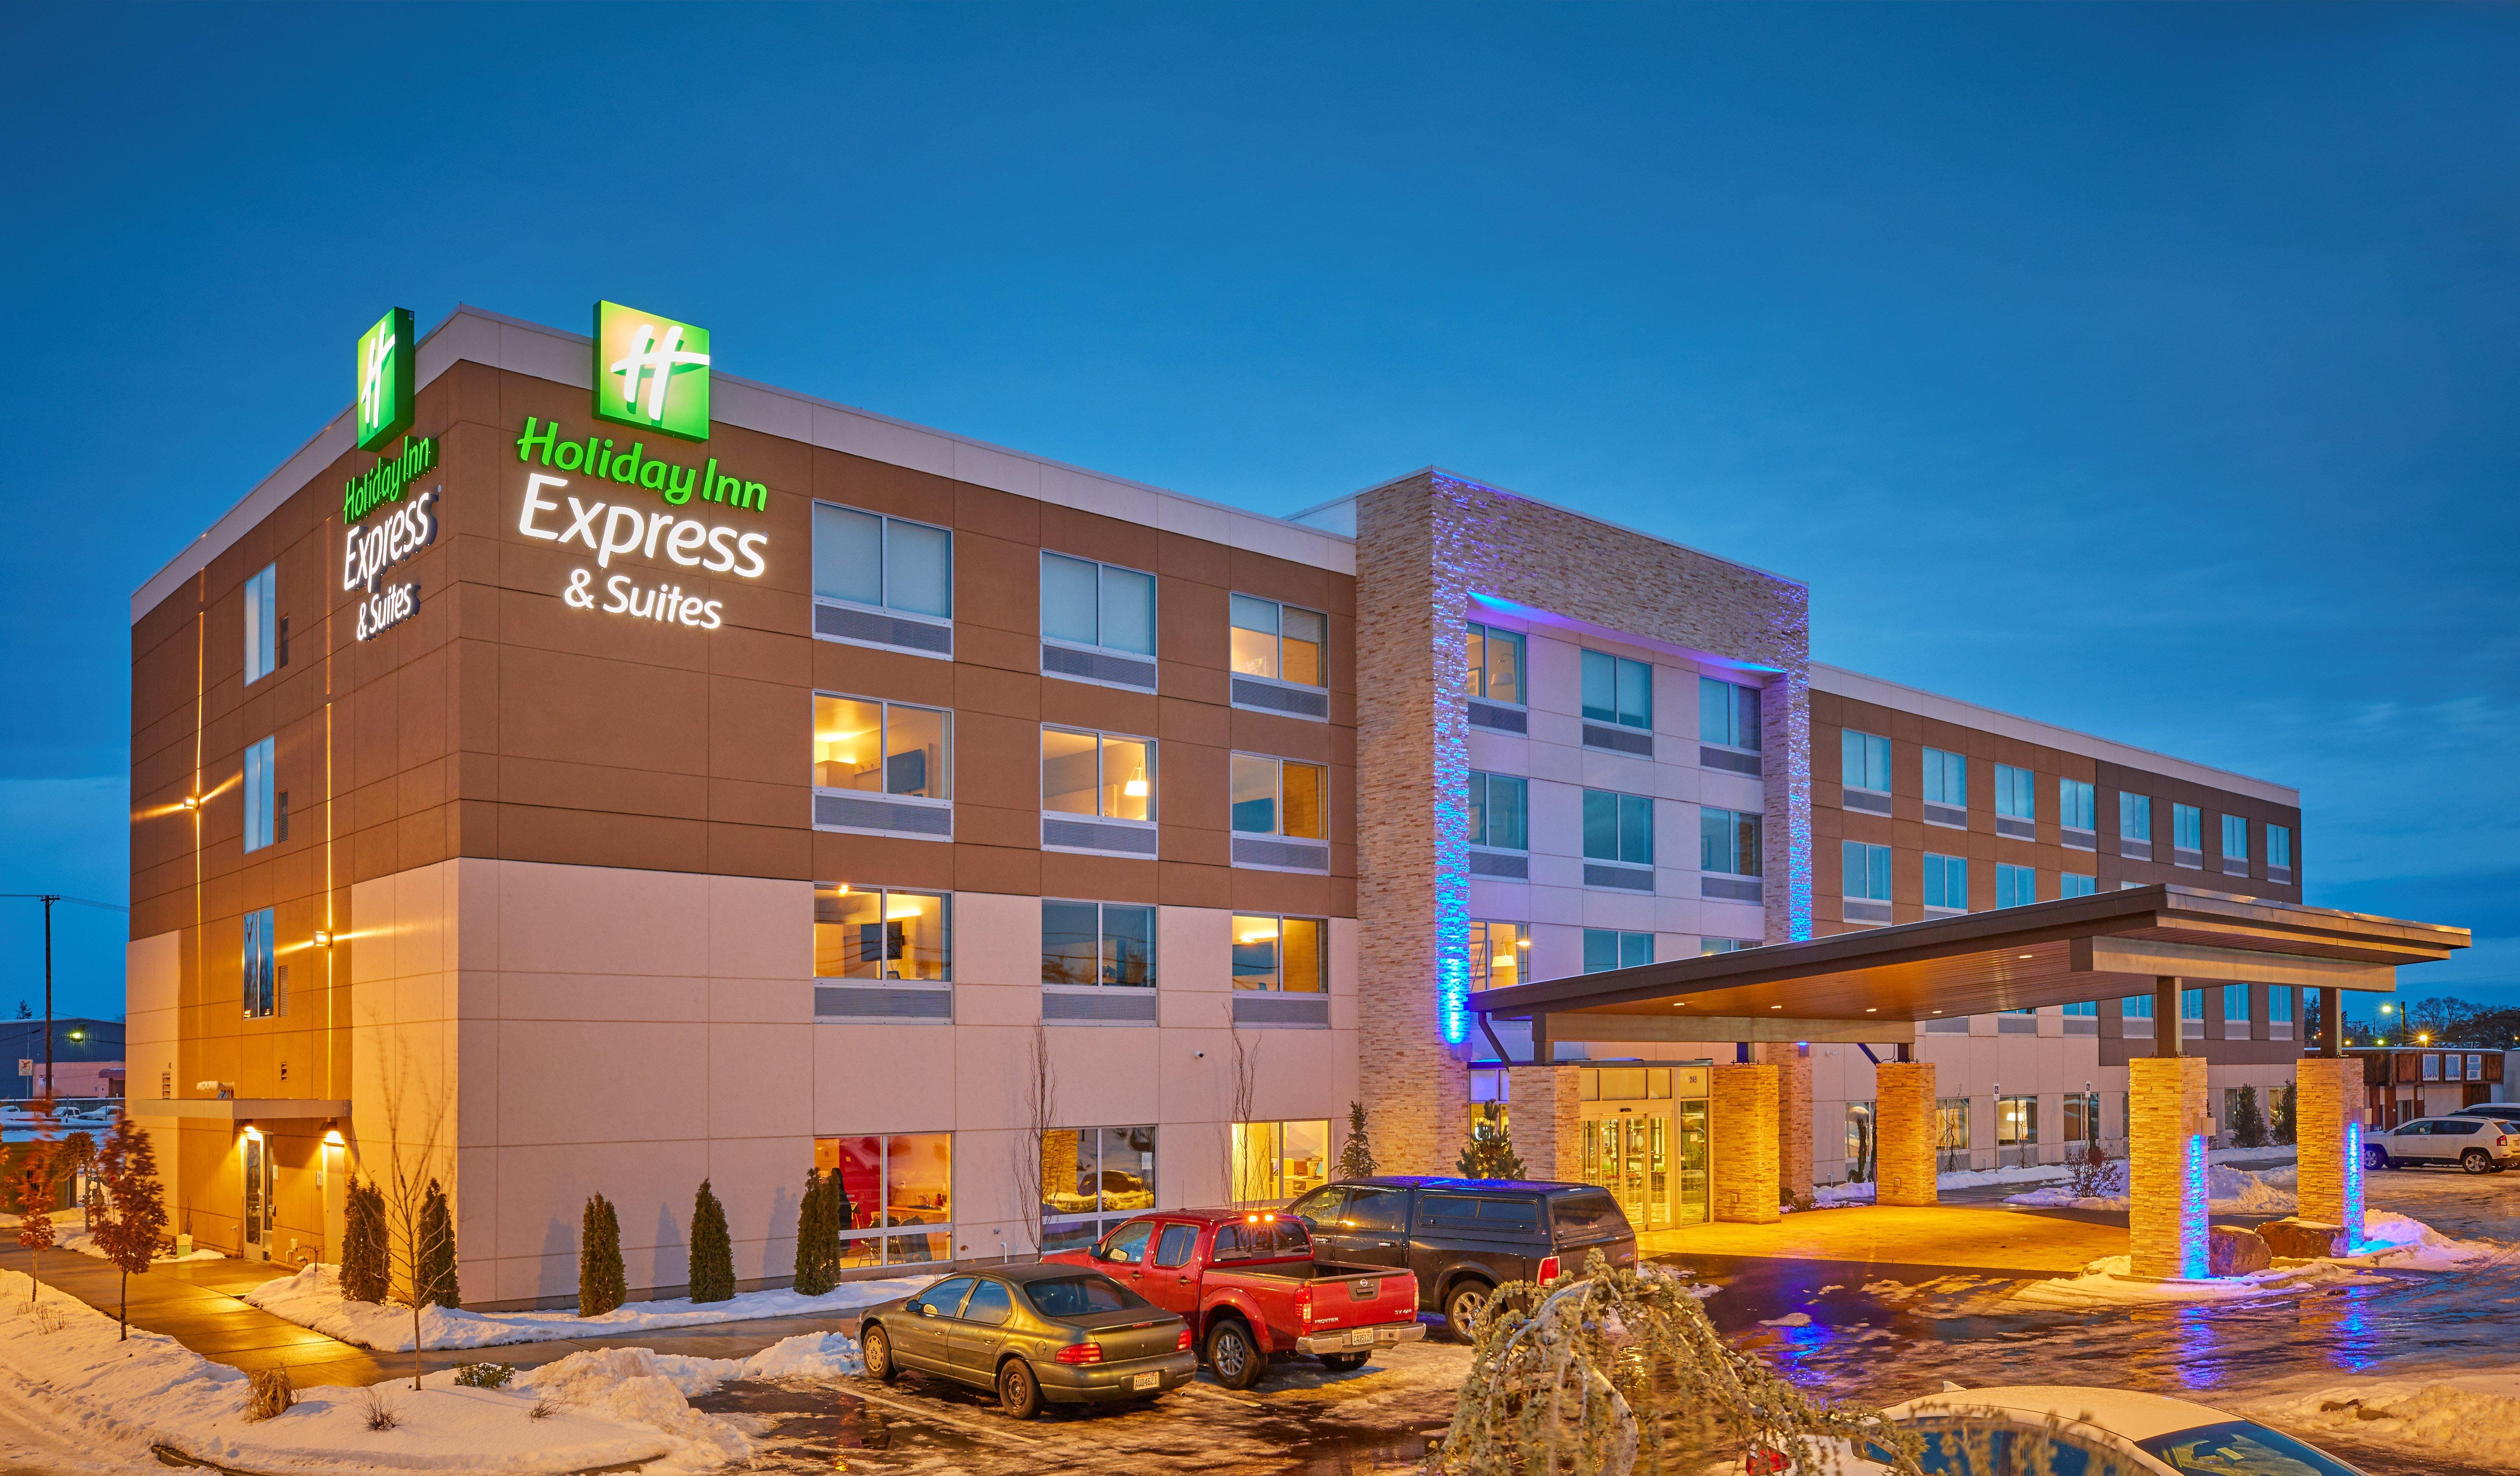 Holiday Inn Express & Suites Hermiston